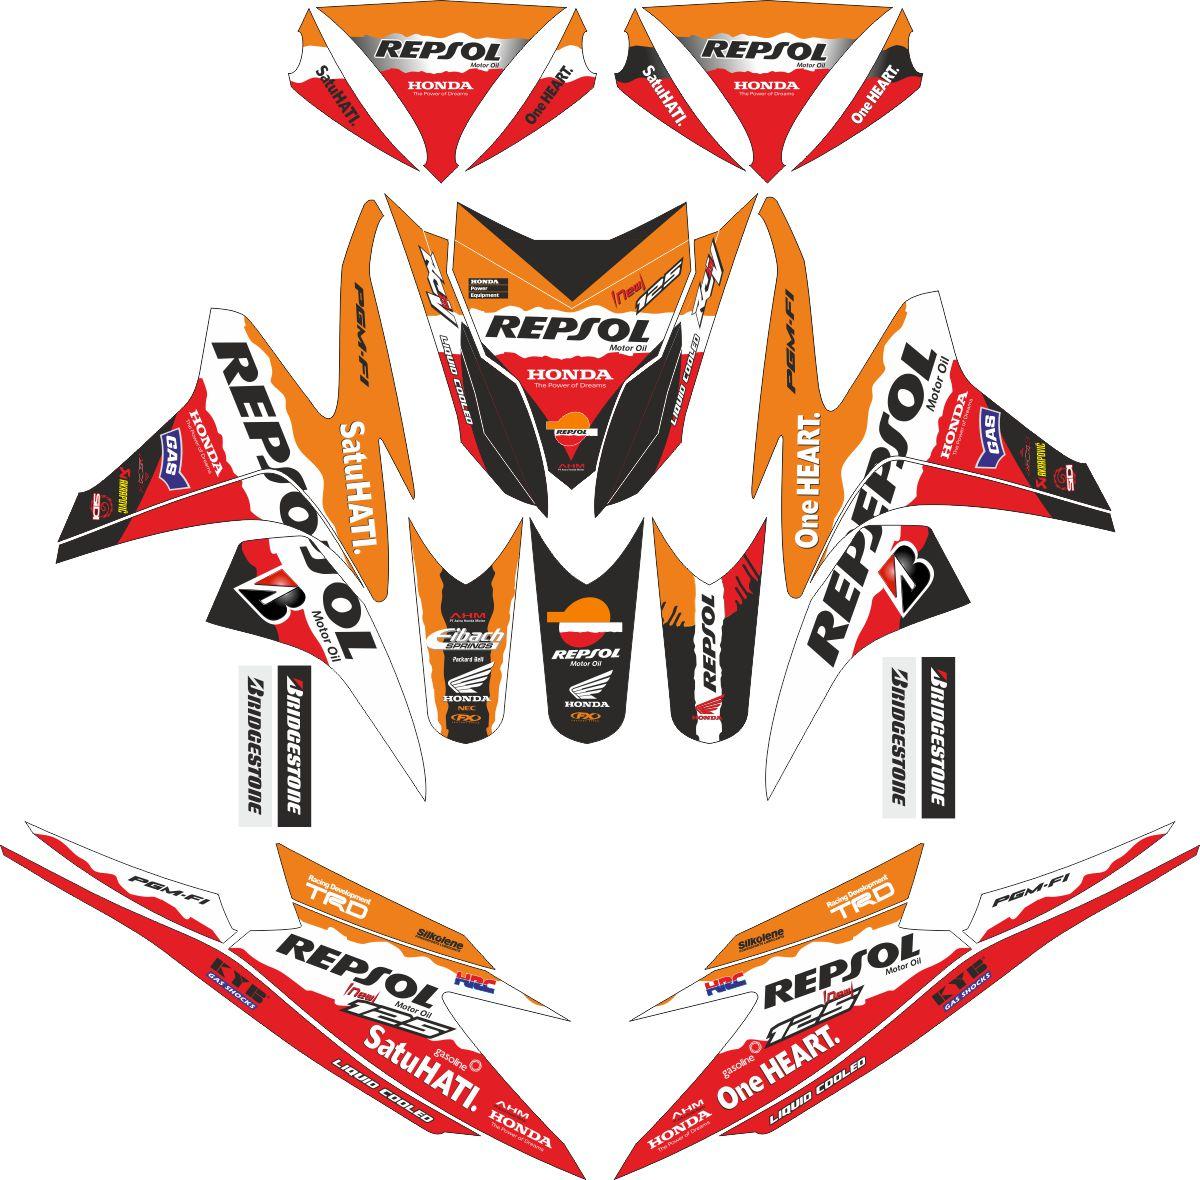 Комплект наклеек на скутер HONDA VARIO PGMFI REPSOL